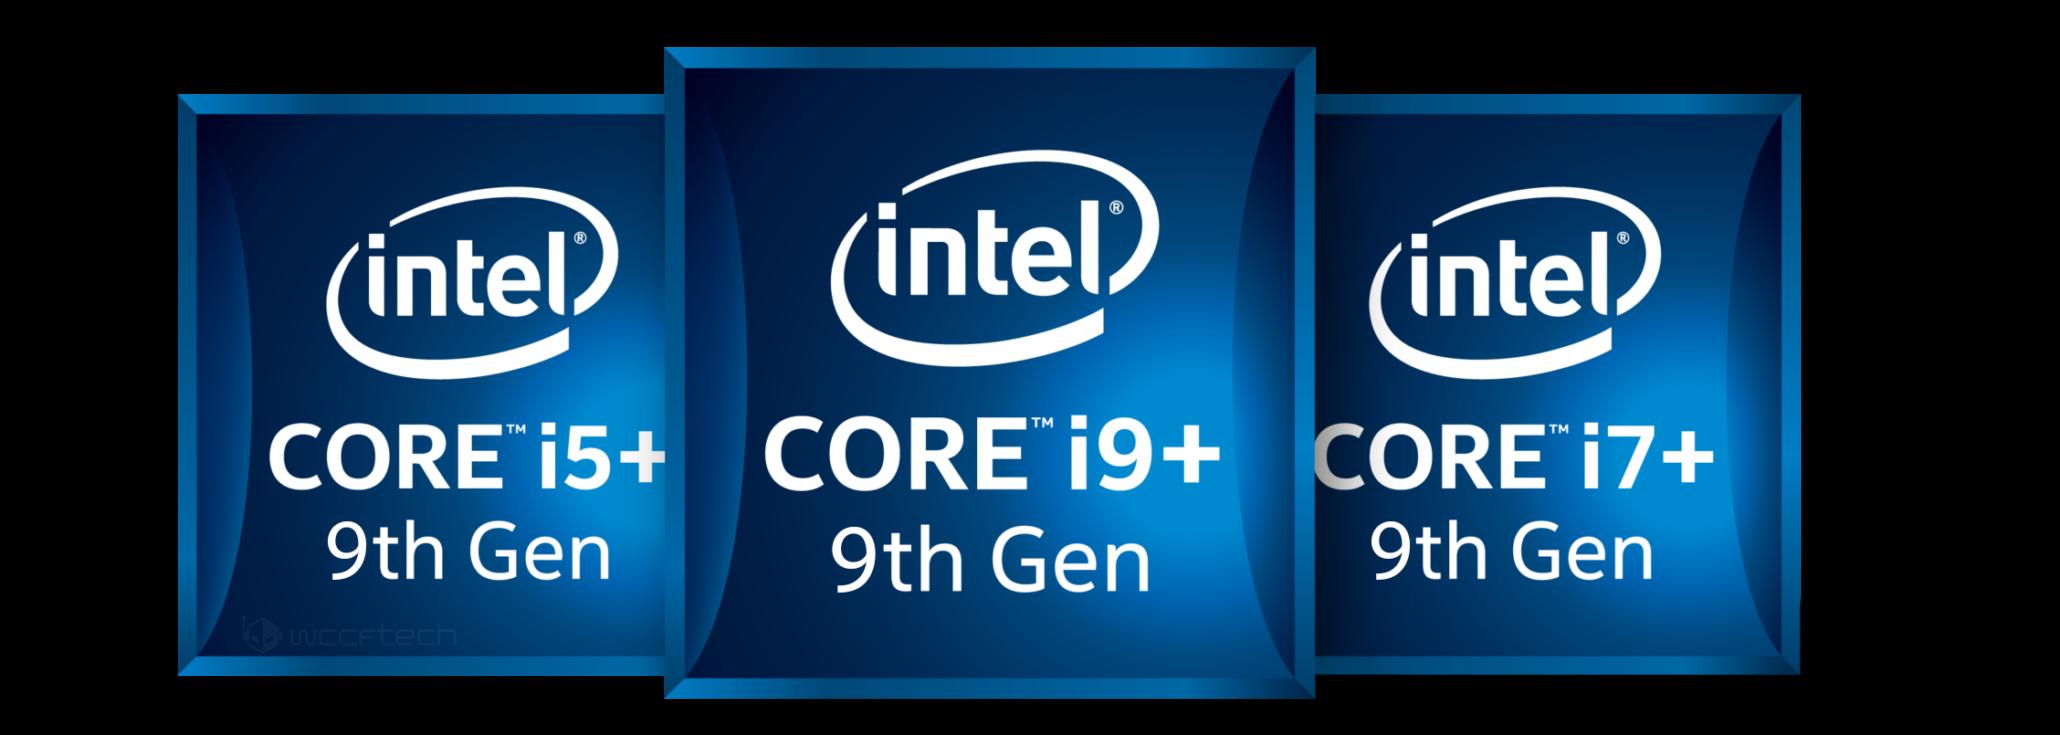 8th-gen-intel-core-platform-extension-badges-2060x713-2060x735.png